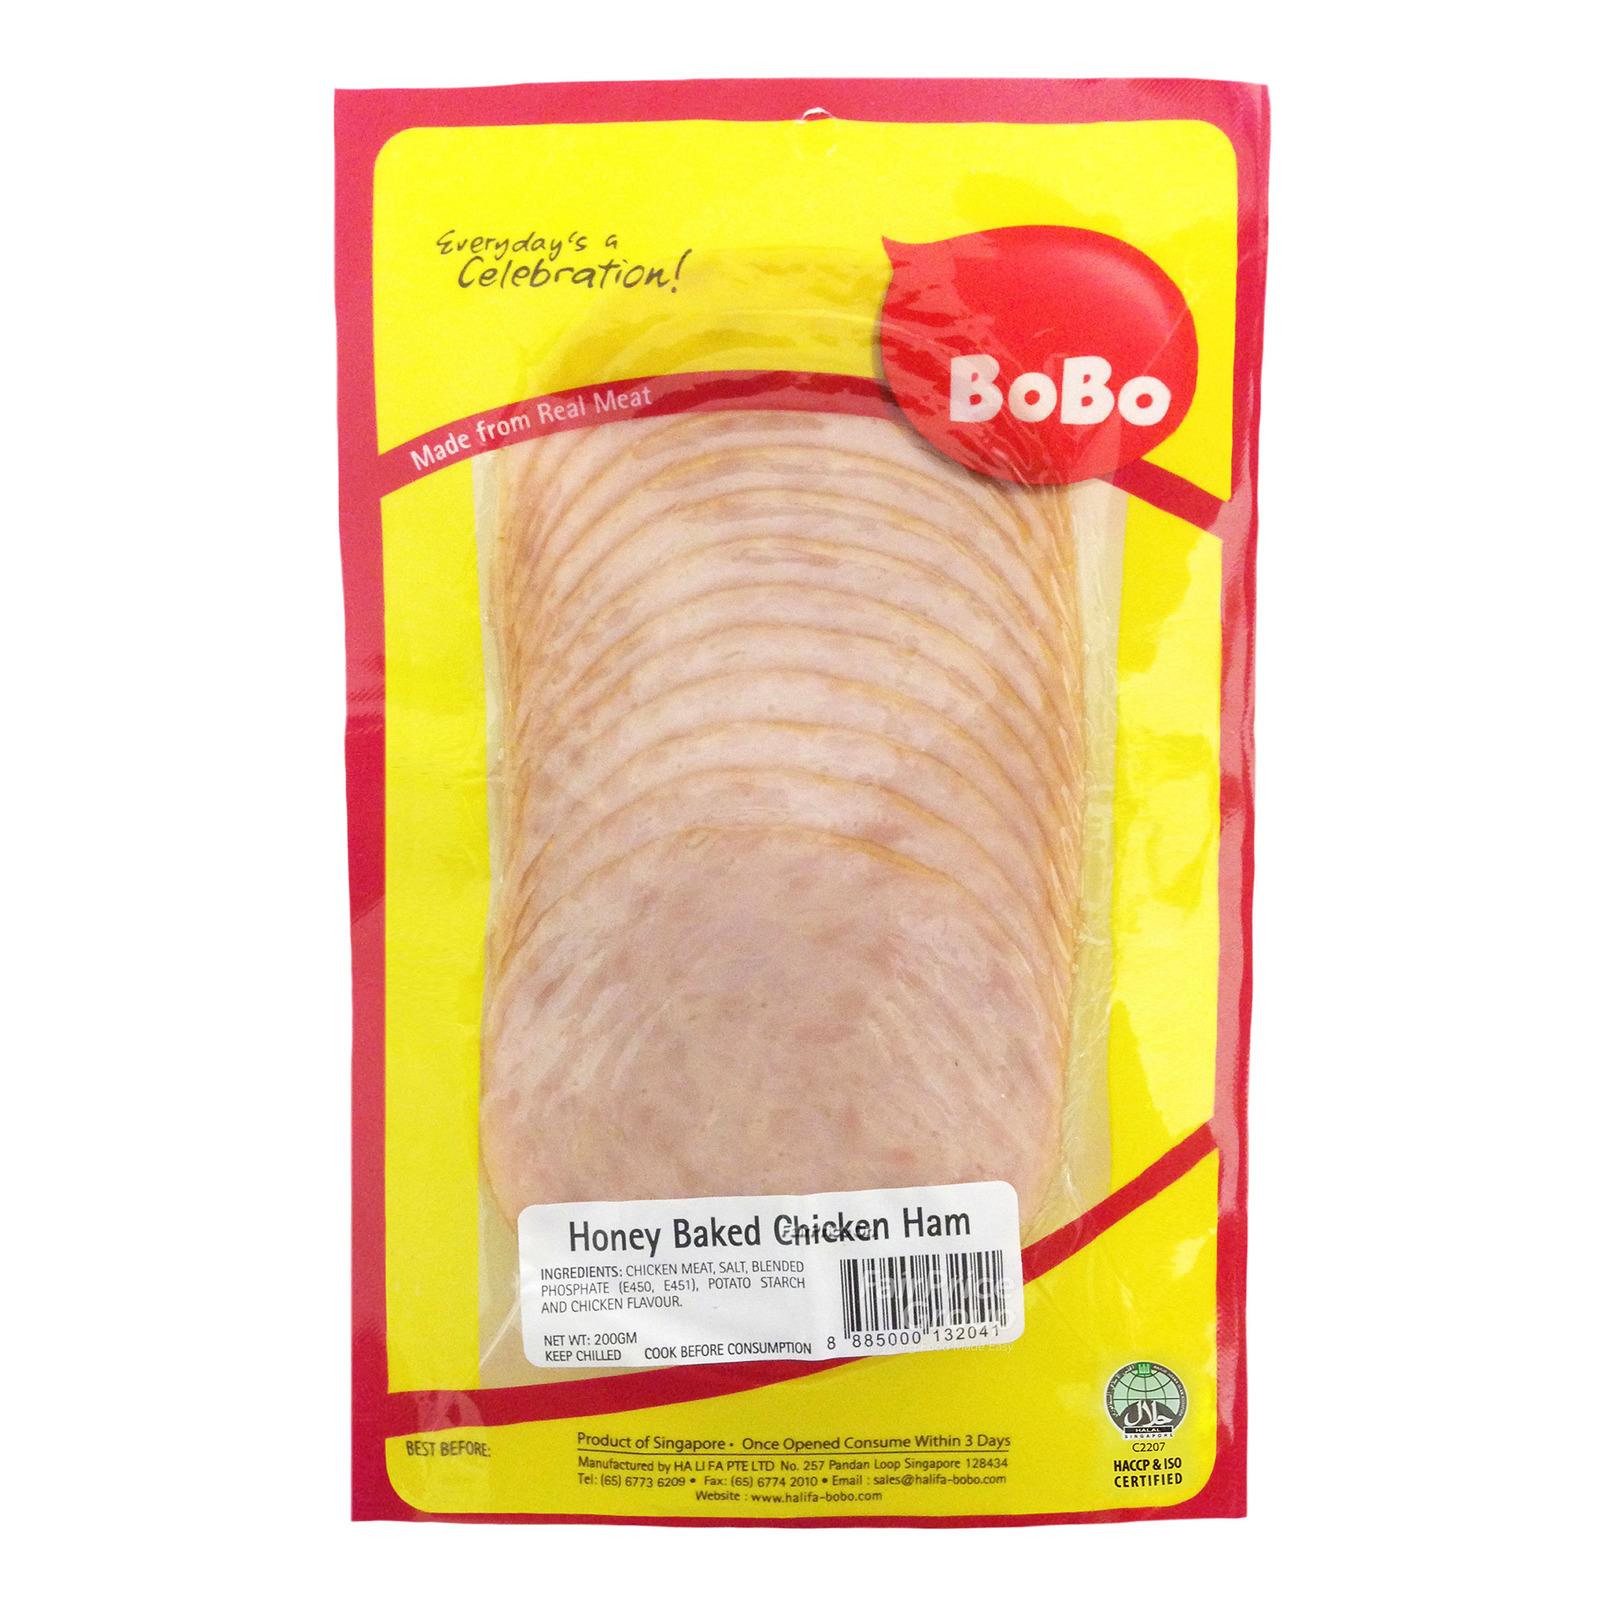 BoBo Chicken Ham - Honey Baked